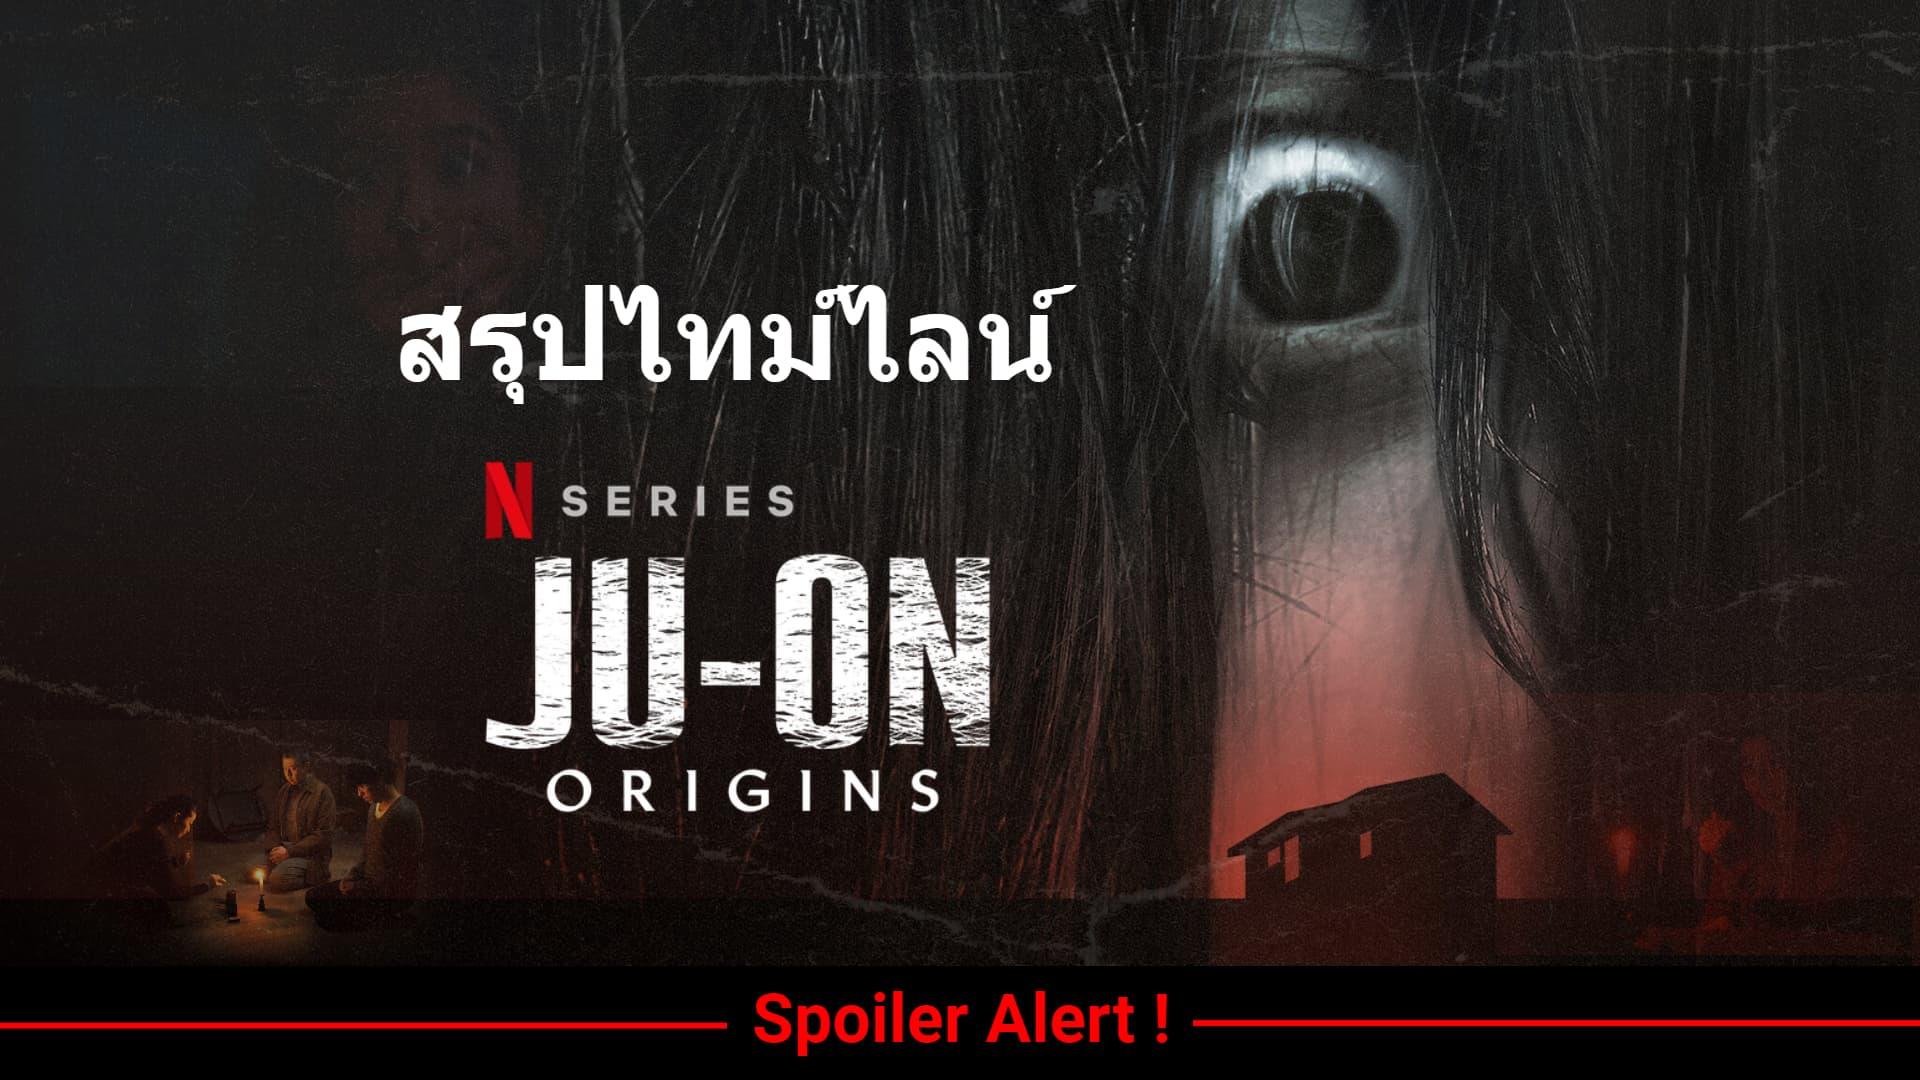 JU-ON: Origins สรุปไทม์ไลน์ตอนจบ อันแสนงงงวยของ จูออน กำเนิดผีโคตรดุ